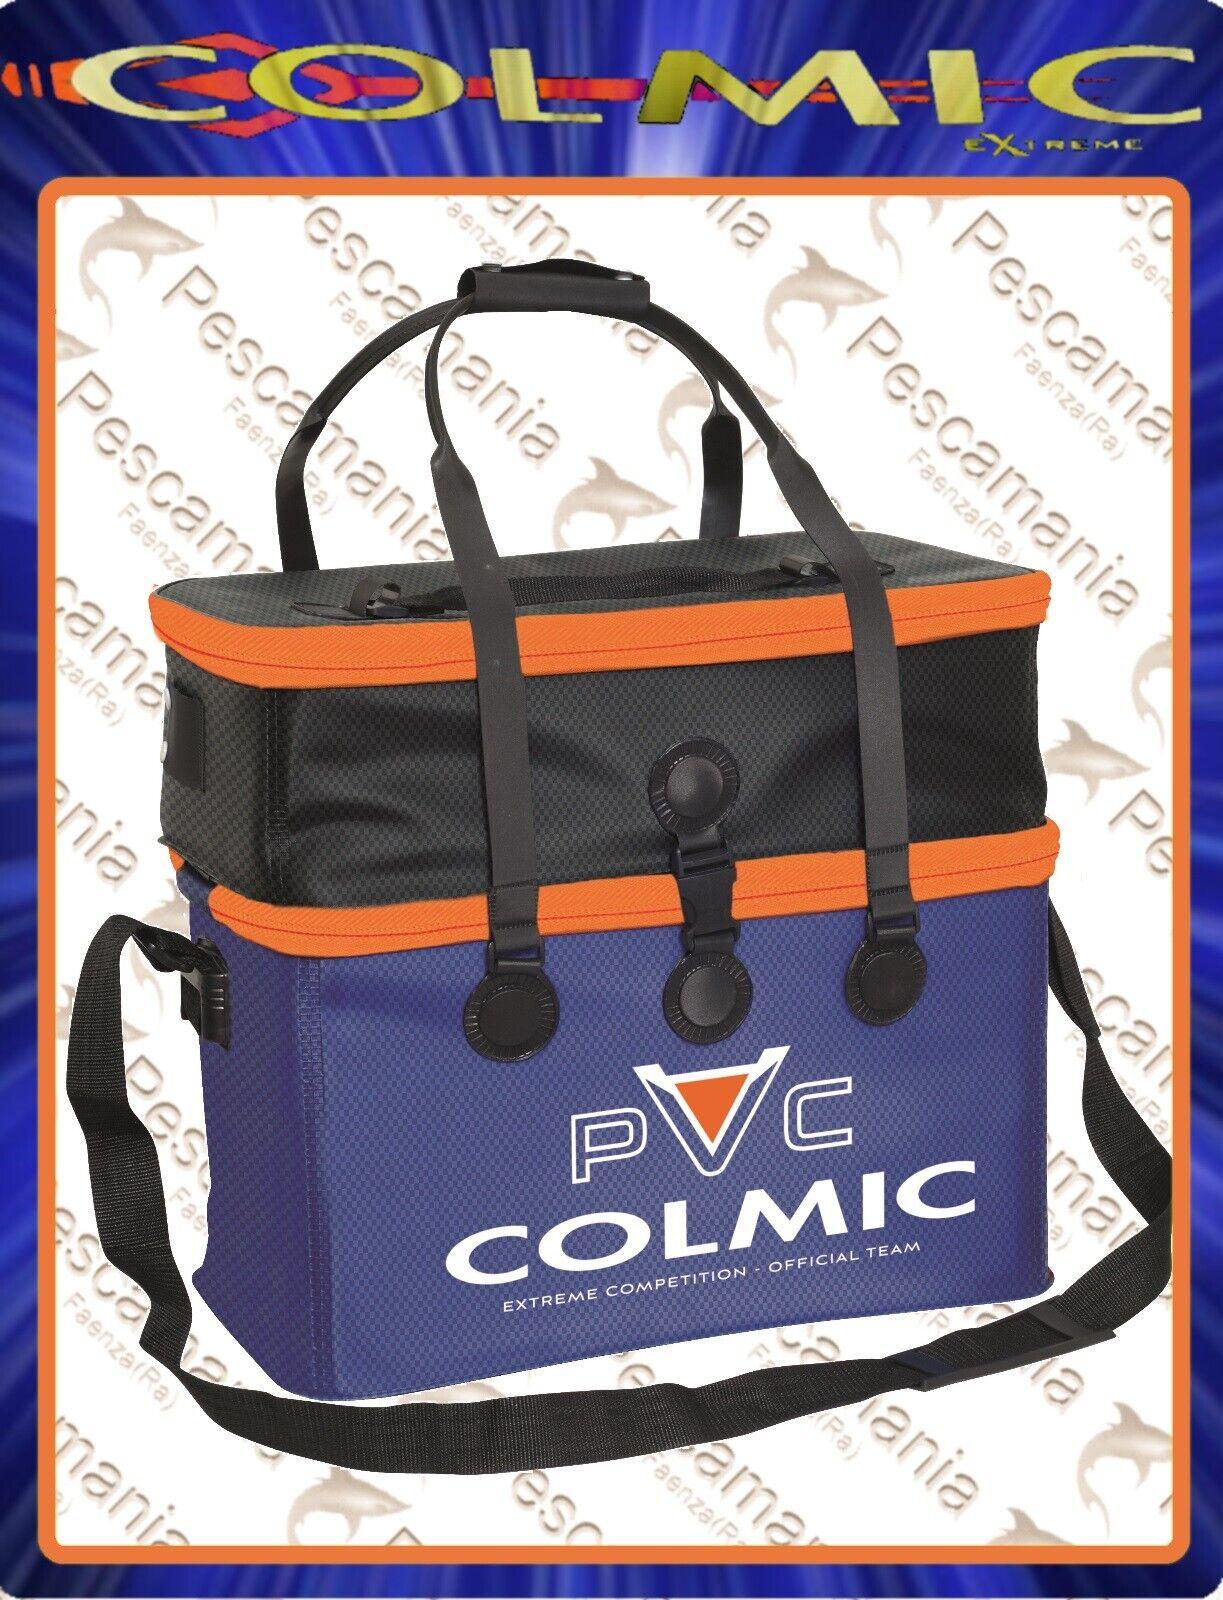 Borsa Colmic PVC jaguar termica cm 5028 5028 5028 H15+28cm Orange series 336ef6